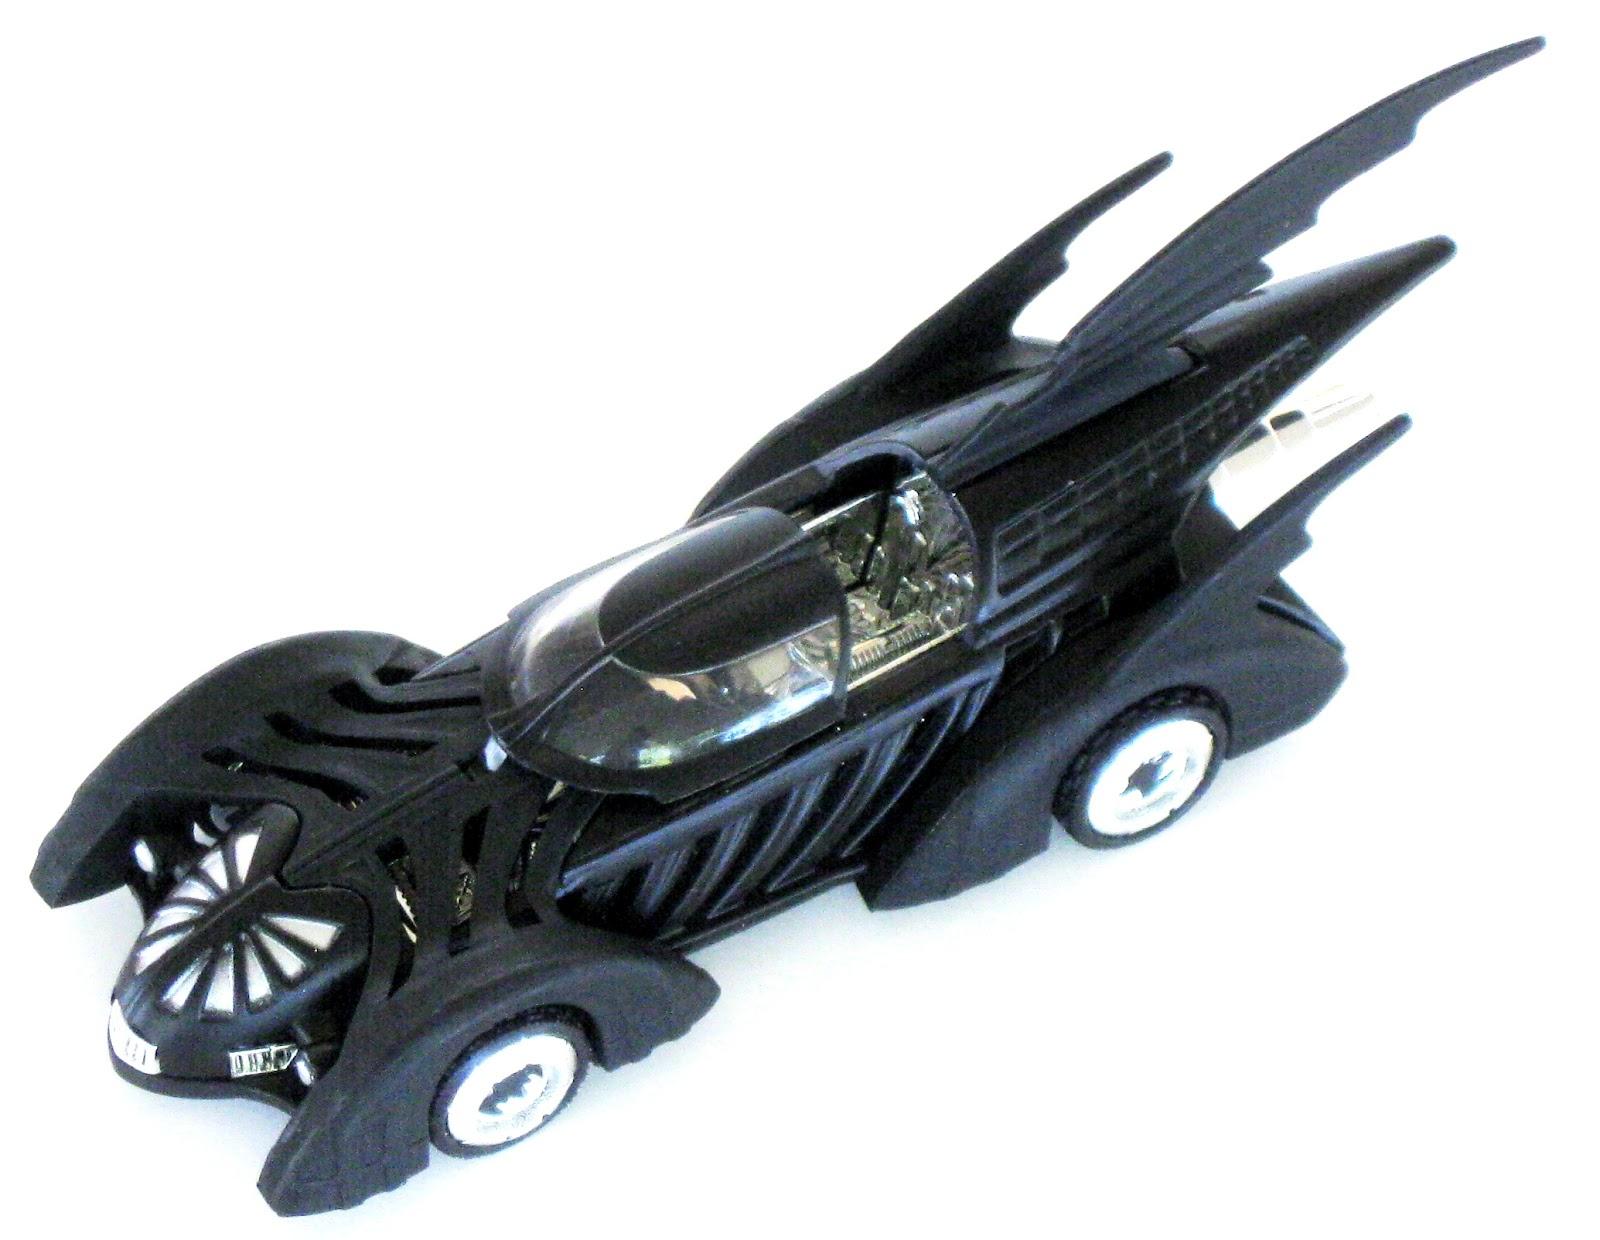 http://2.bp.blogspot.com/-fkFSOapPpPk/UGhlmudIAWI/AAAAAAAAOU4/02yT4VSMyX4/s1600/Mattel%20#5389%202011%20Batman%20Forever%20Batmobile%2012.JPG